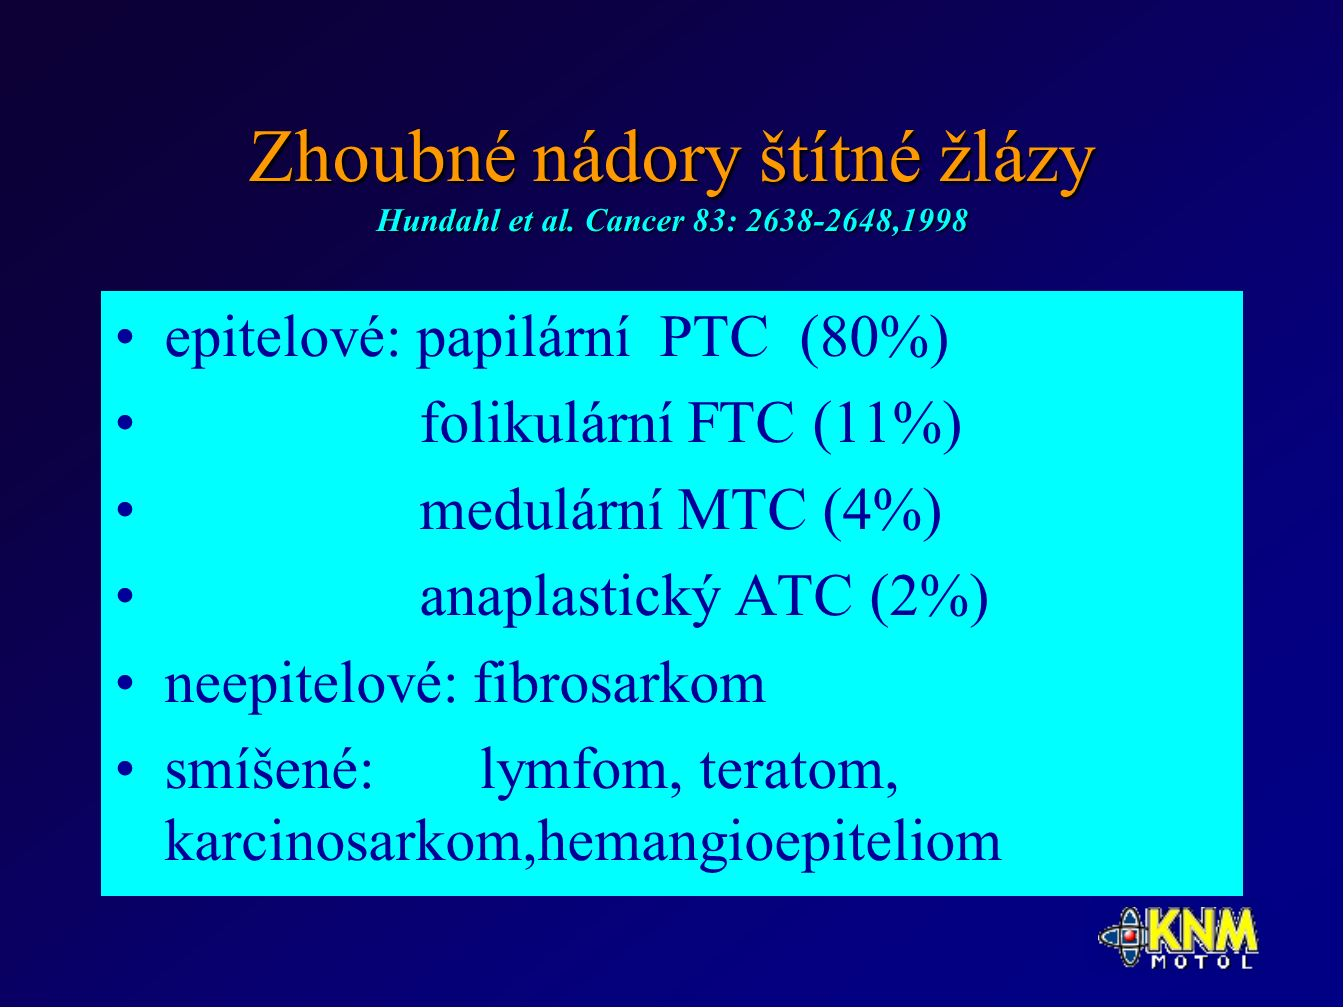 Zhoubné nádory štítné žlázy Hundahl et al.